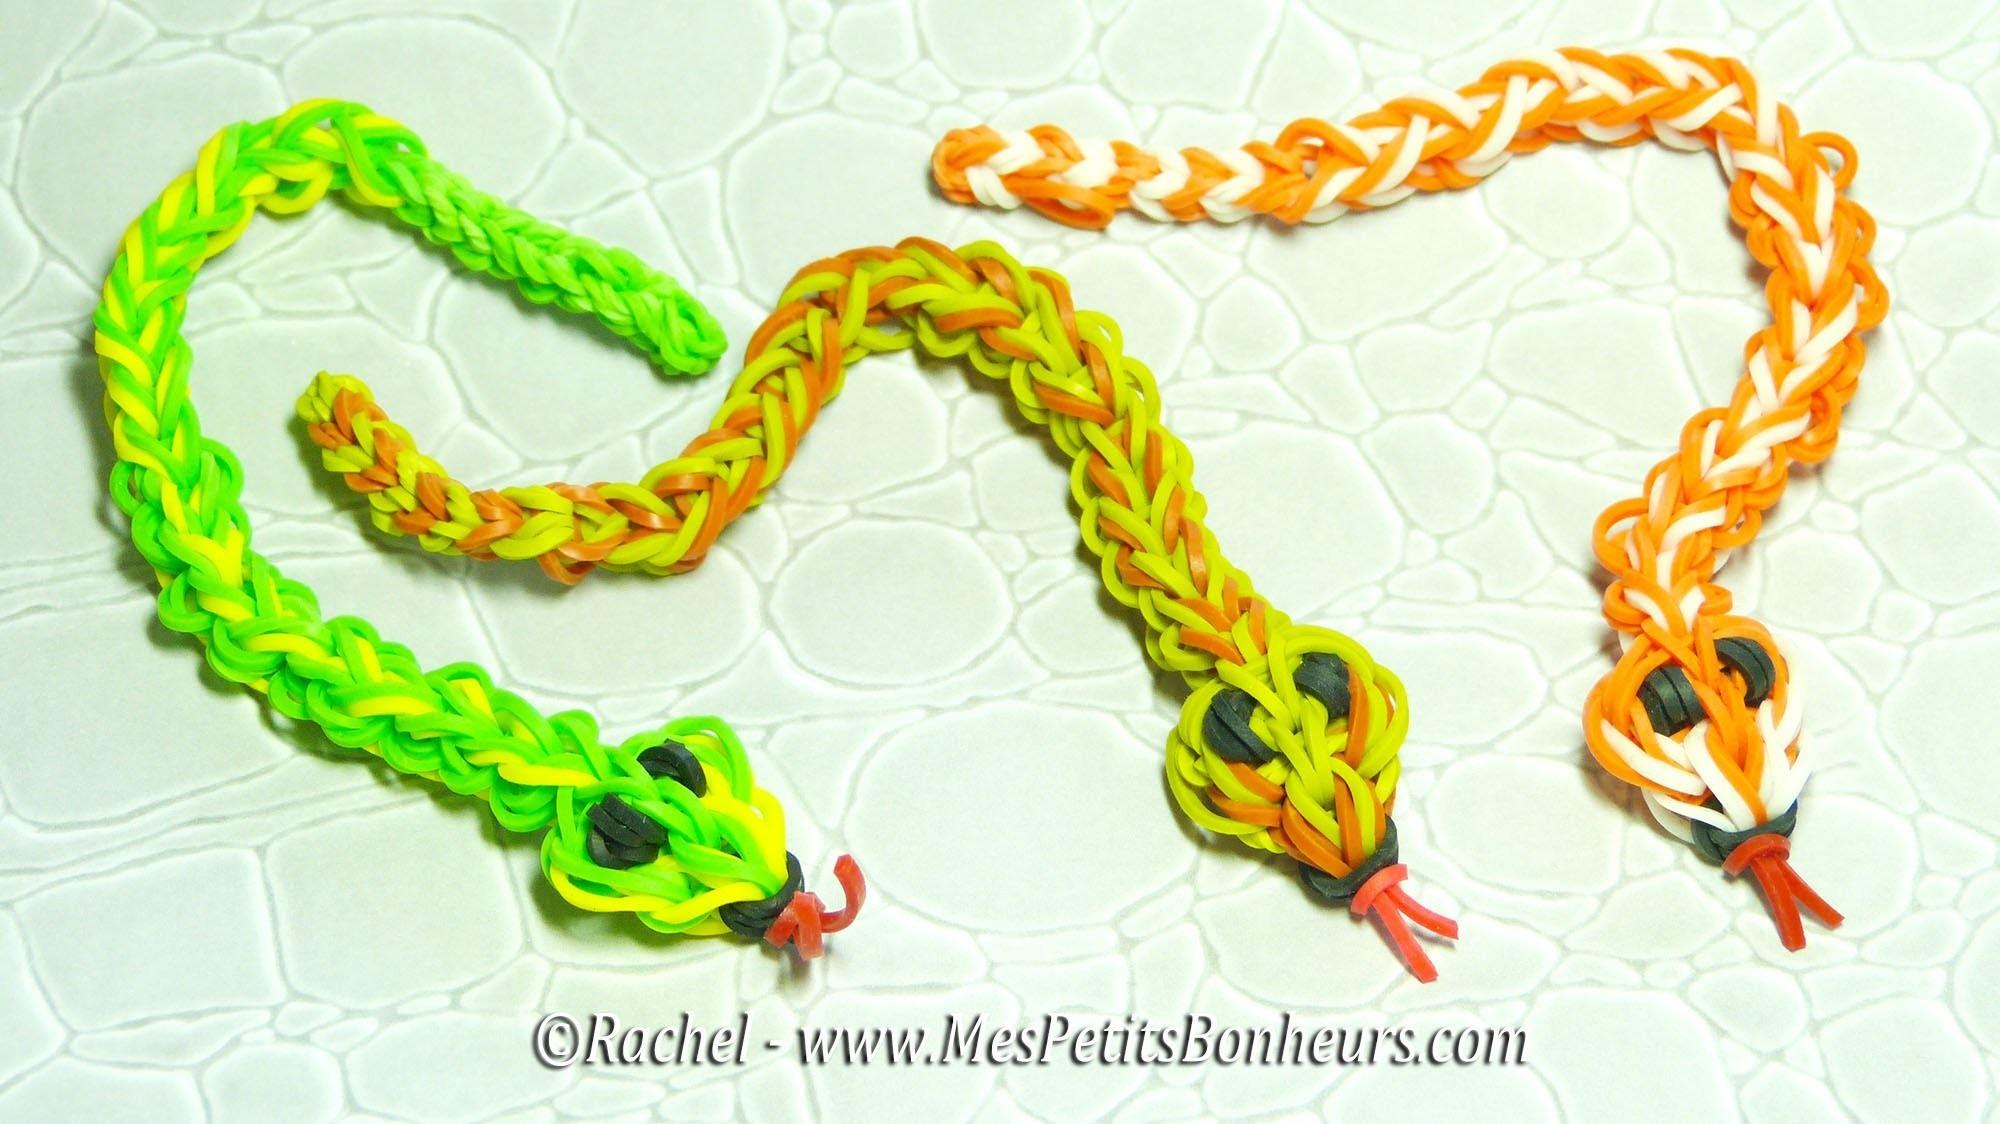 Serpent en élastiques Rainbow Loom Tuto - Niveau avancé